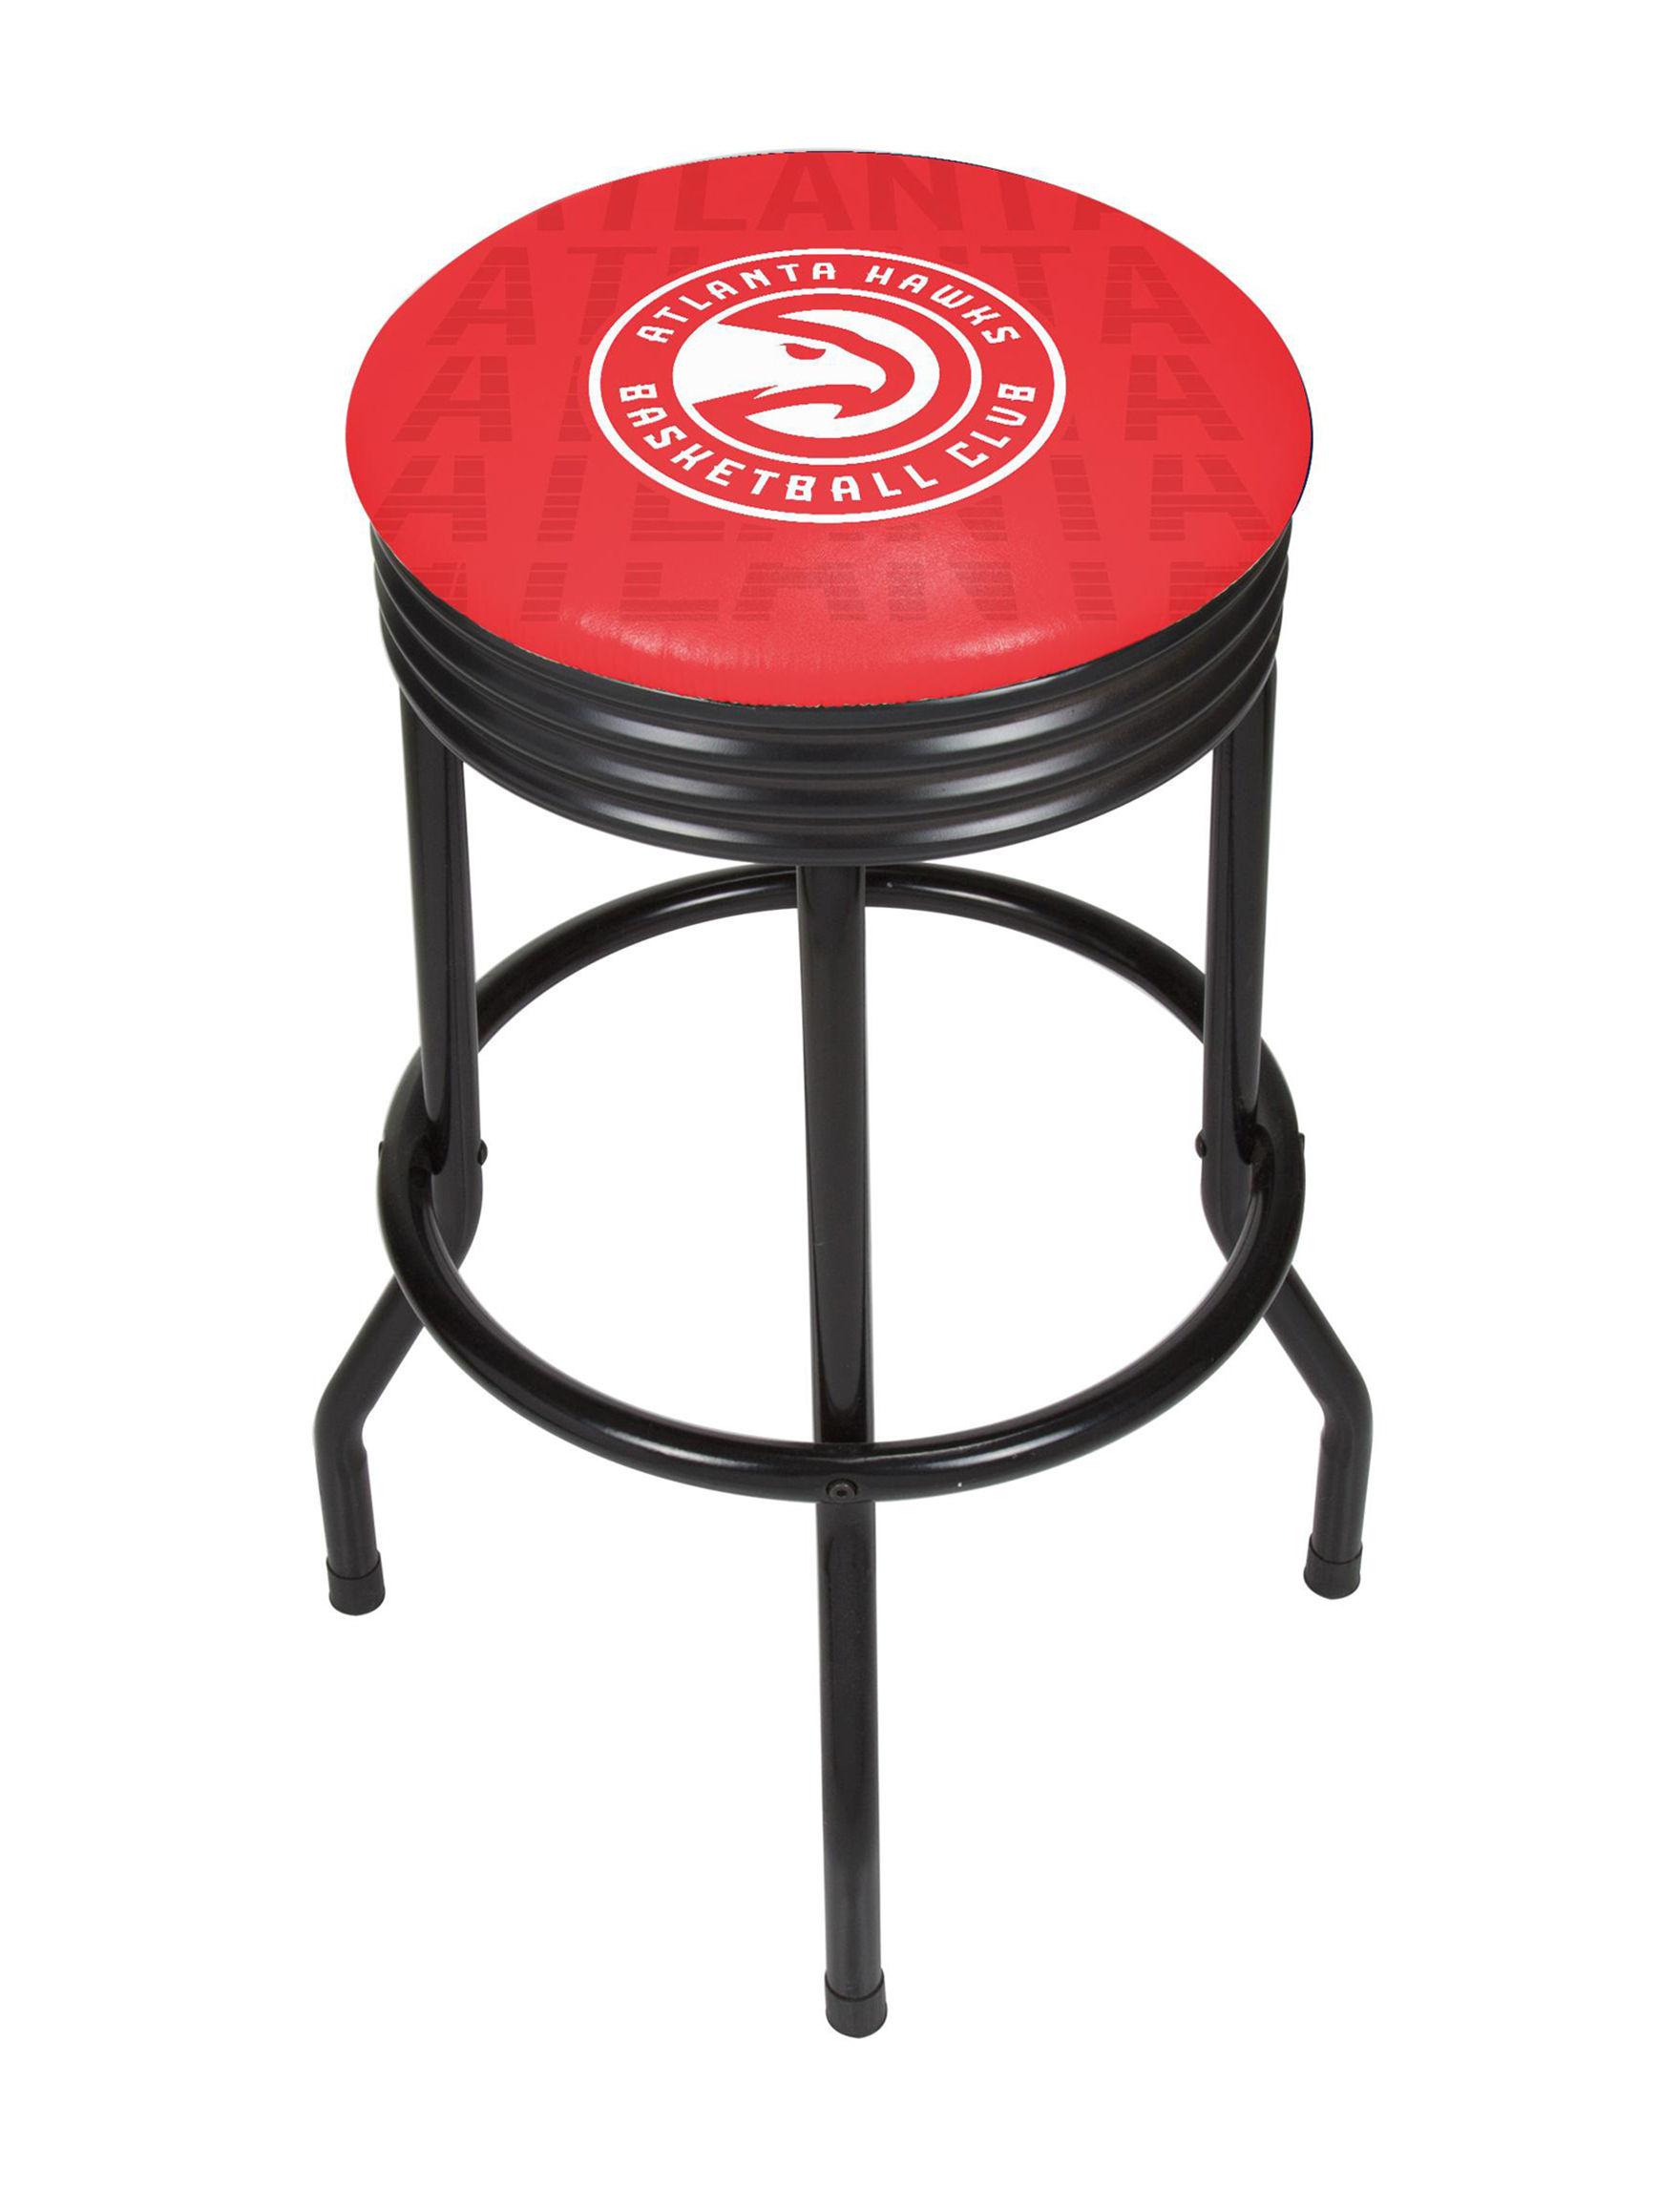 NBA Red / White Bar & Kitchen Stools Kitchen & Dining Furniture